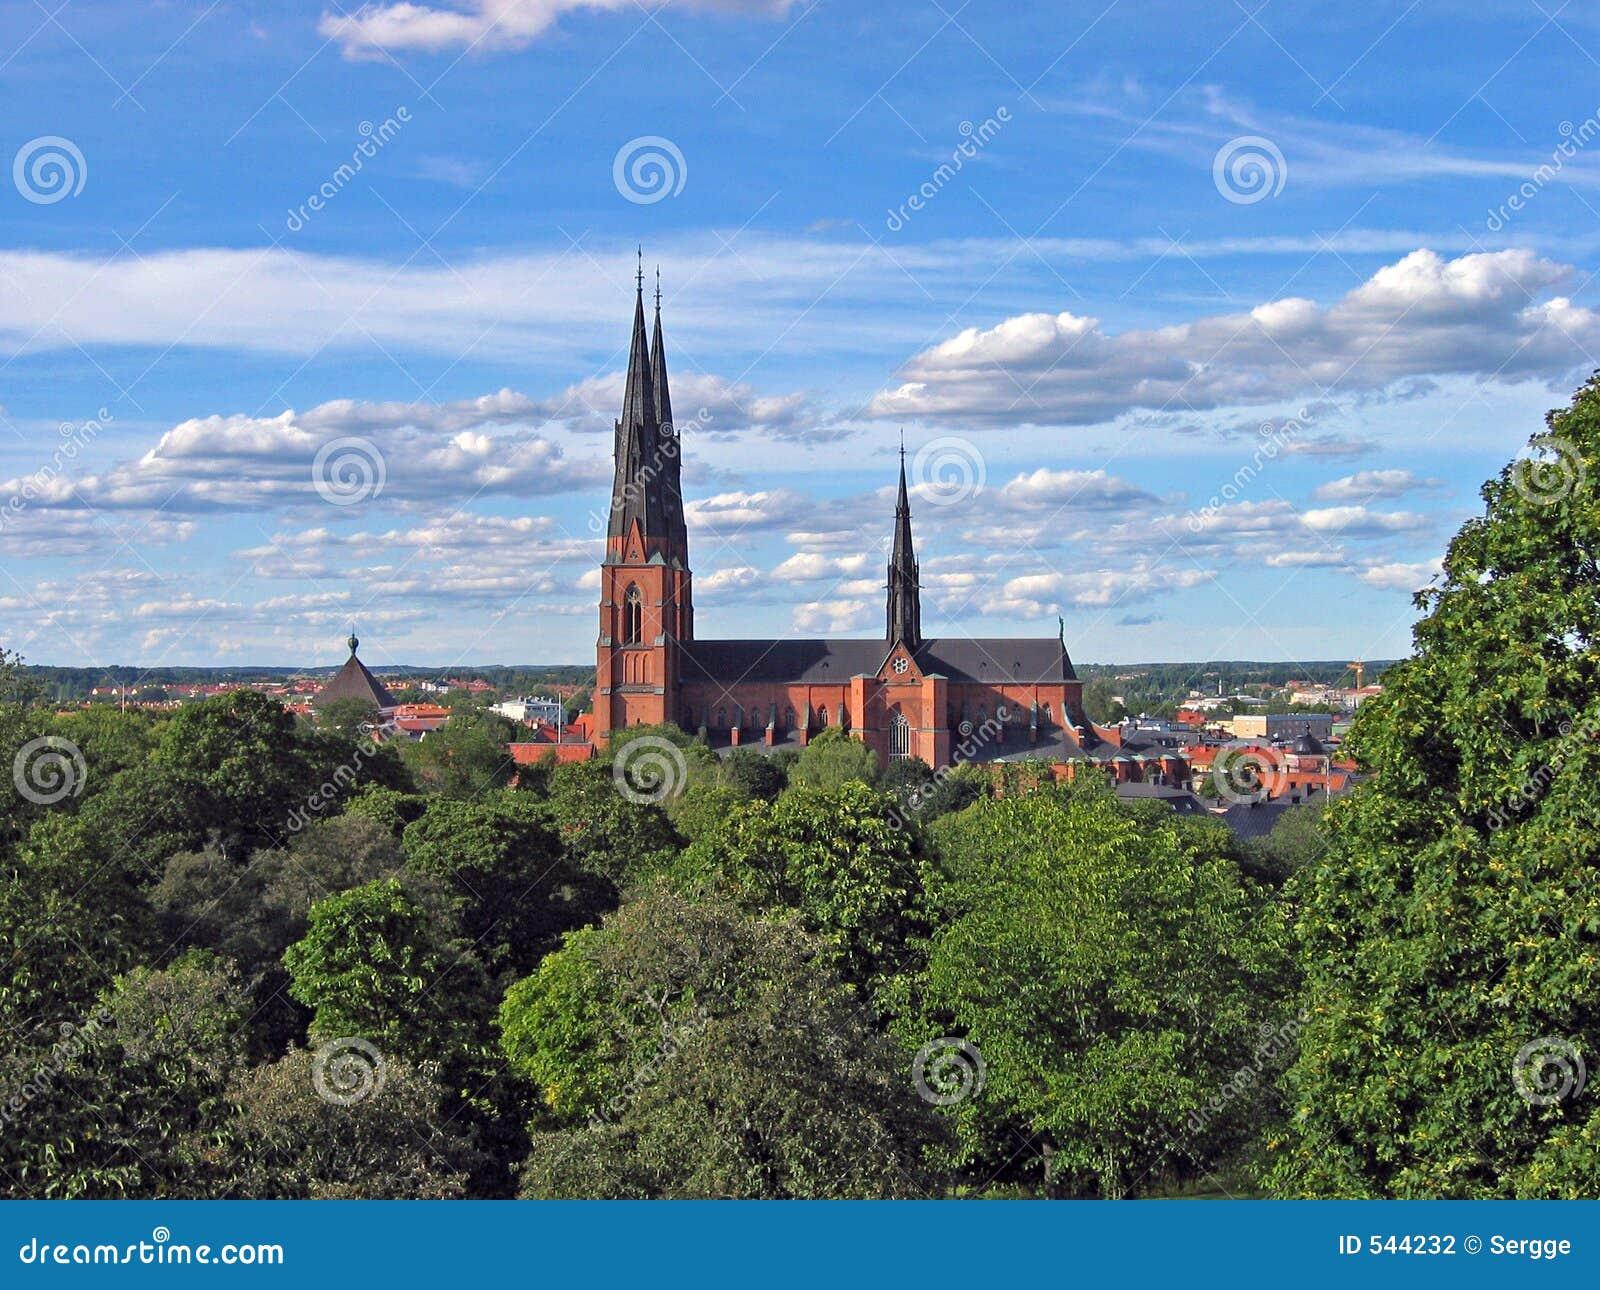 Download 大教堂瑞典乌普萨拉 库存照片. 图片 包括有 拱道, 大教堂, 结构树, 云彩, 路德教会, 瑞典, 教会, 欧洲 - 544232